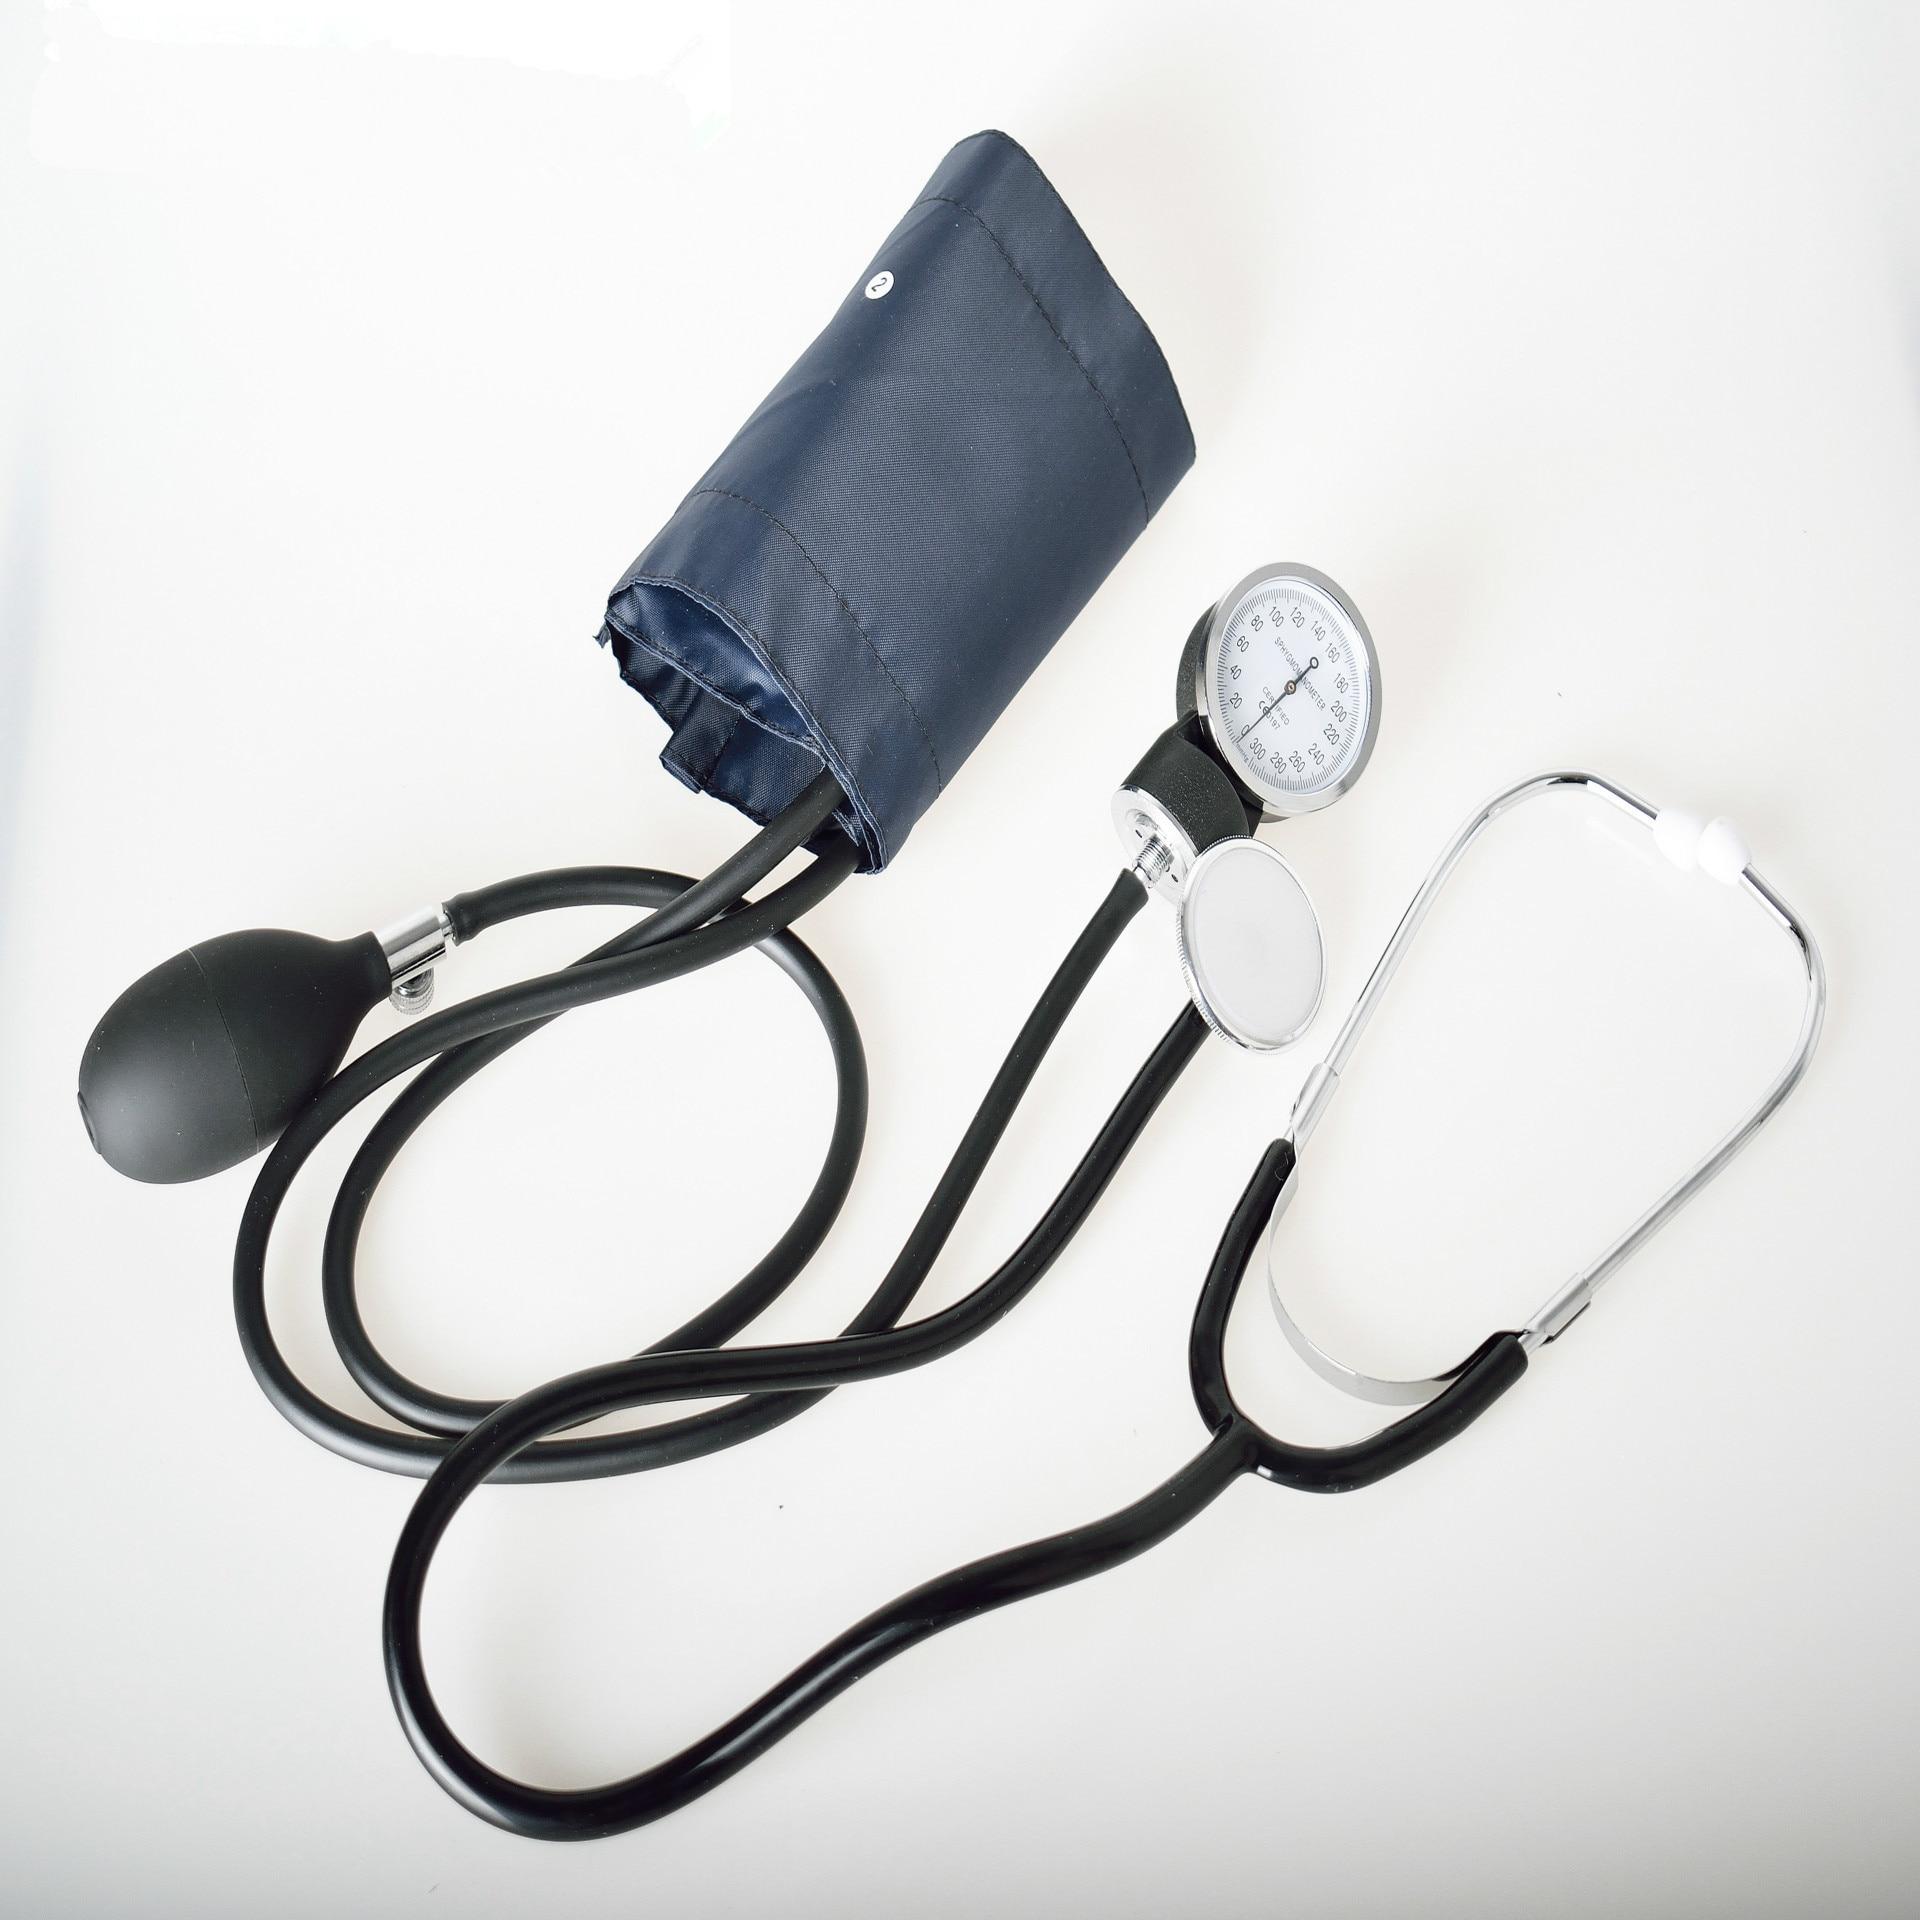 Medizinische Blutdruckmessgerät Meter Tonometer Manschette Stethoskop Kit Reise Blutdruckmessgerät